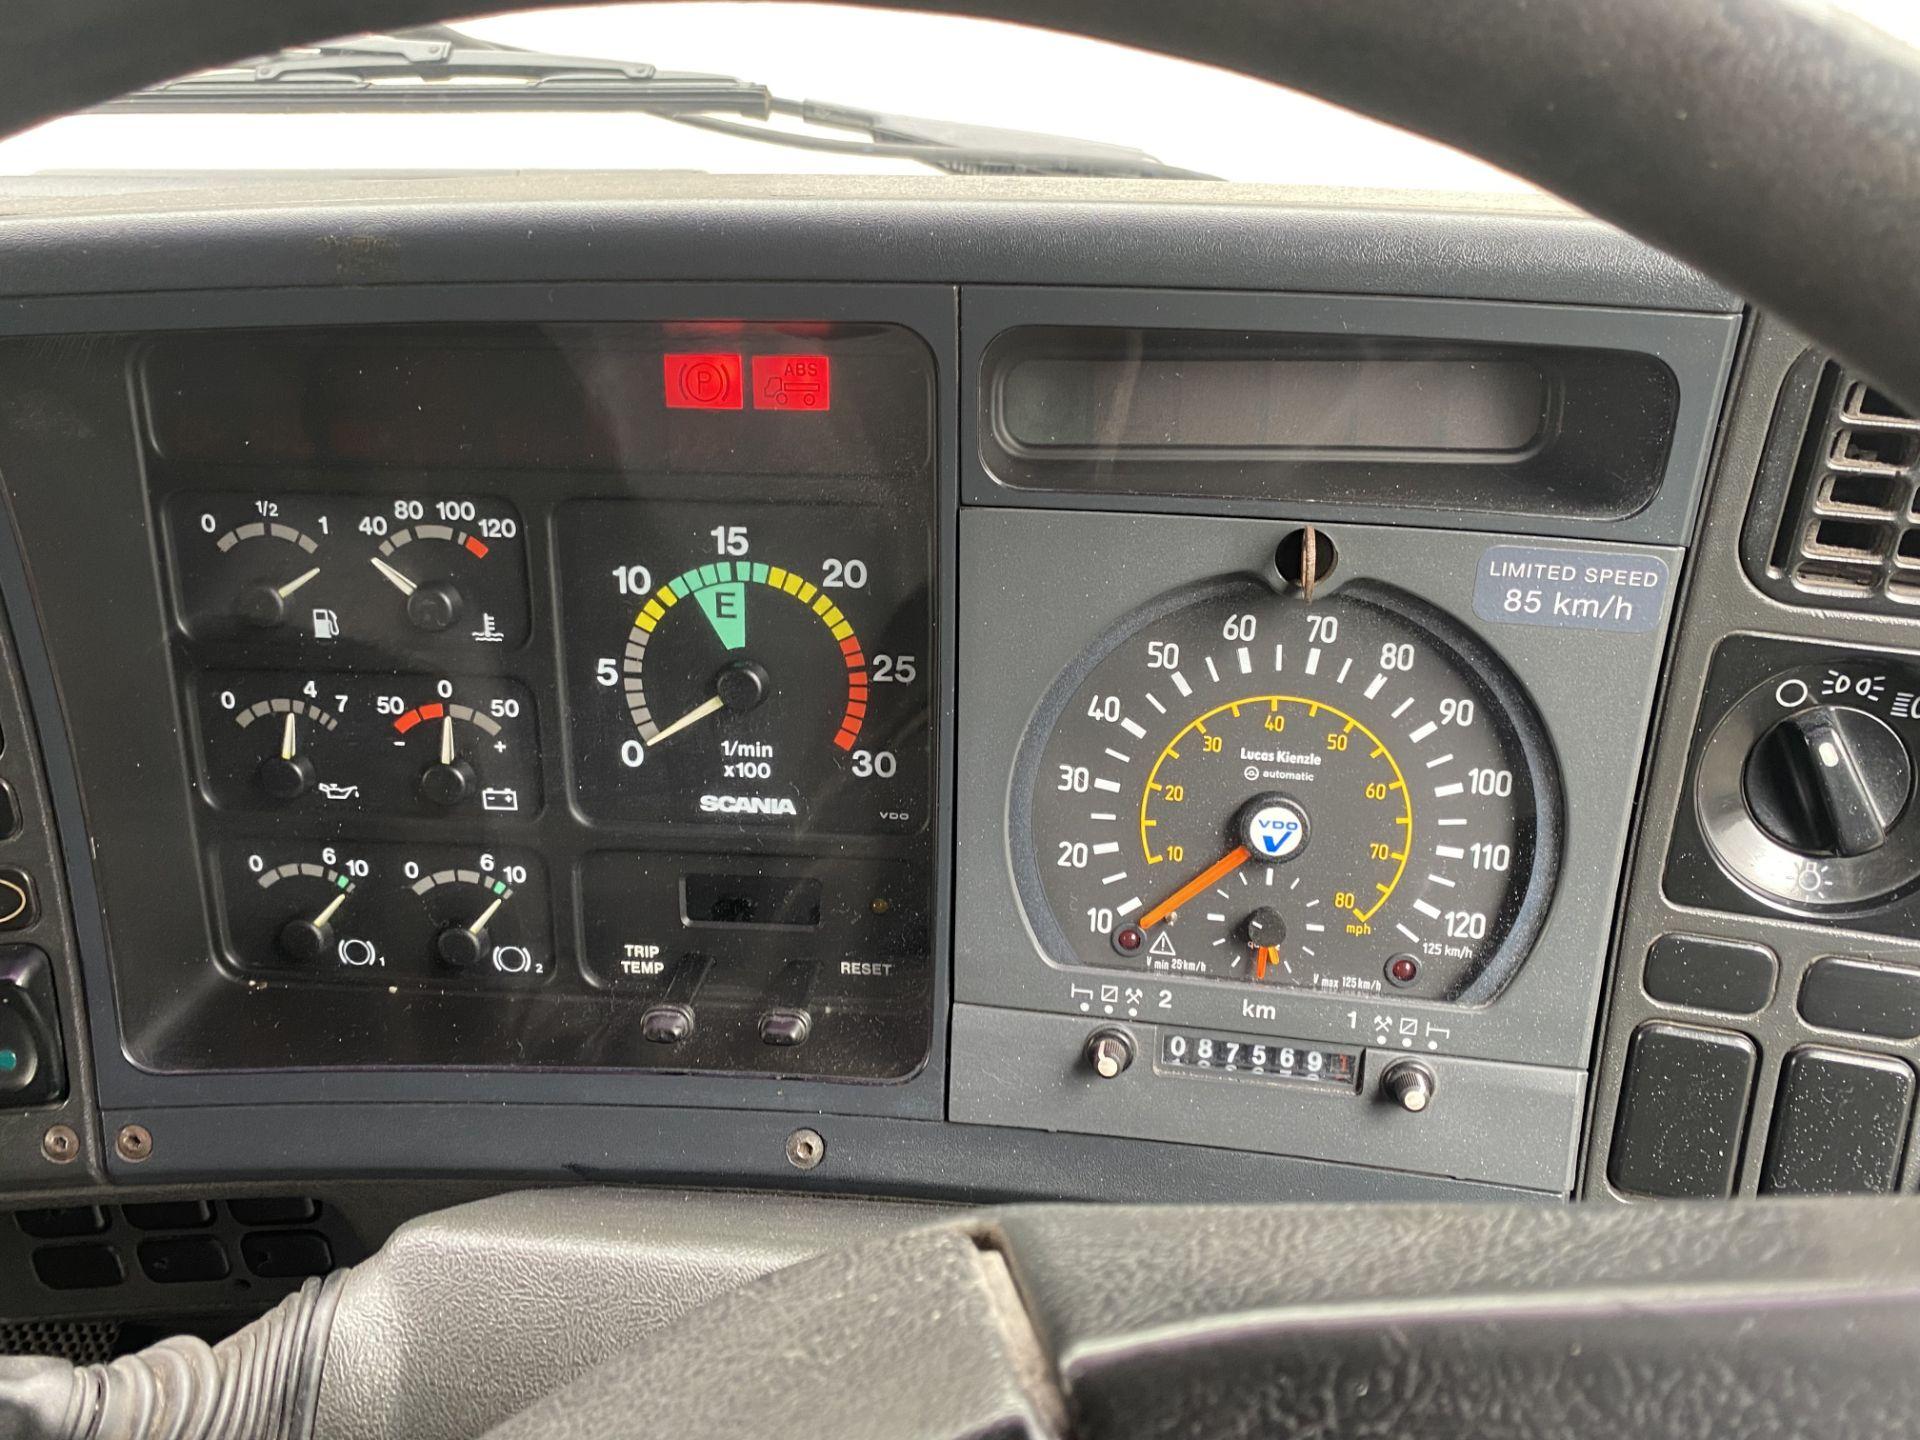 Scania 143M450 V8 4X2 TRACTOR UNIT, registration no. L288 BPV, date first registered 01/08/1993, - Image 18 of 20